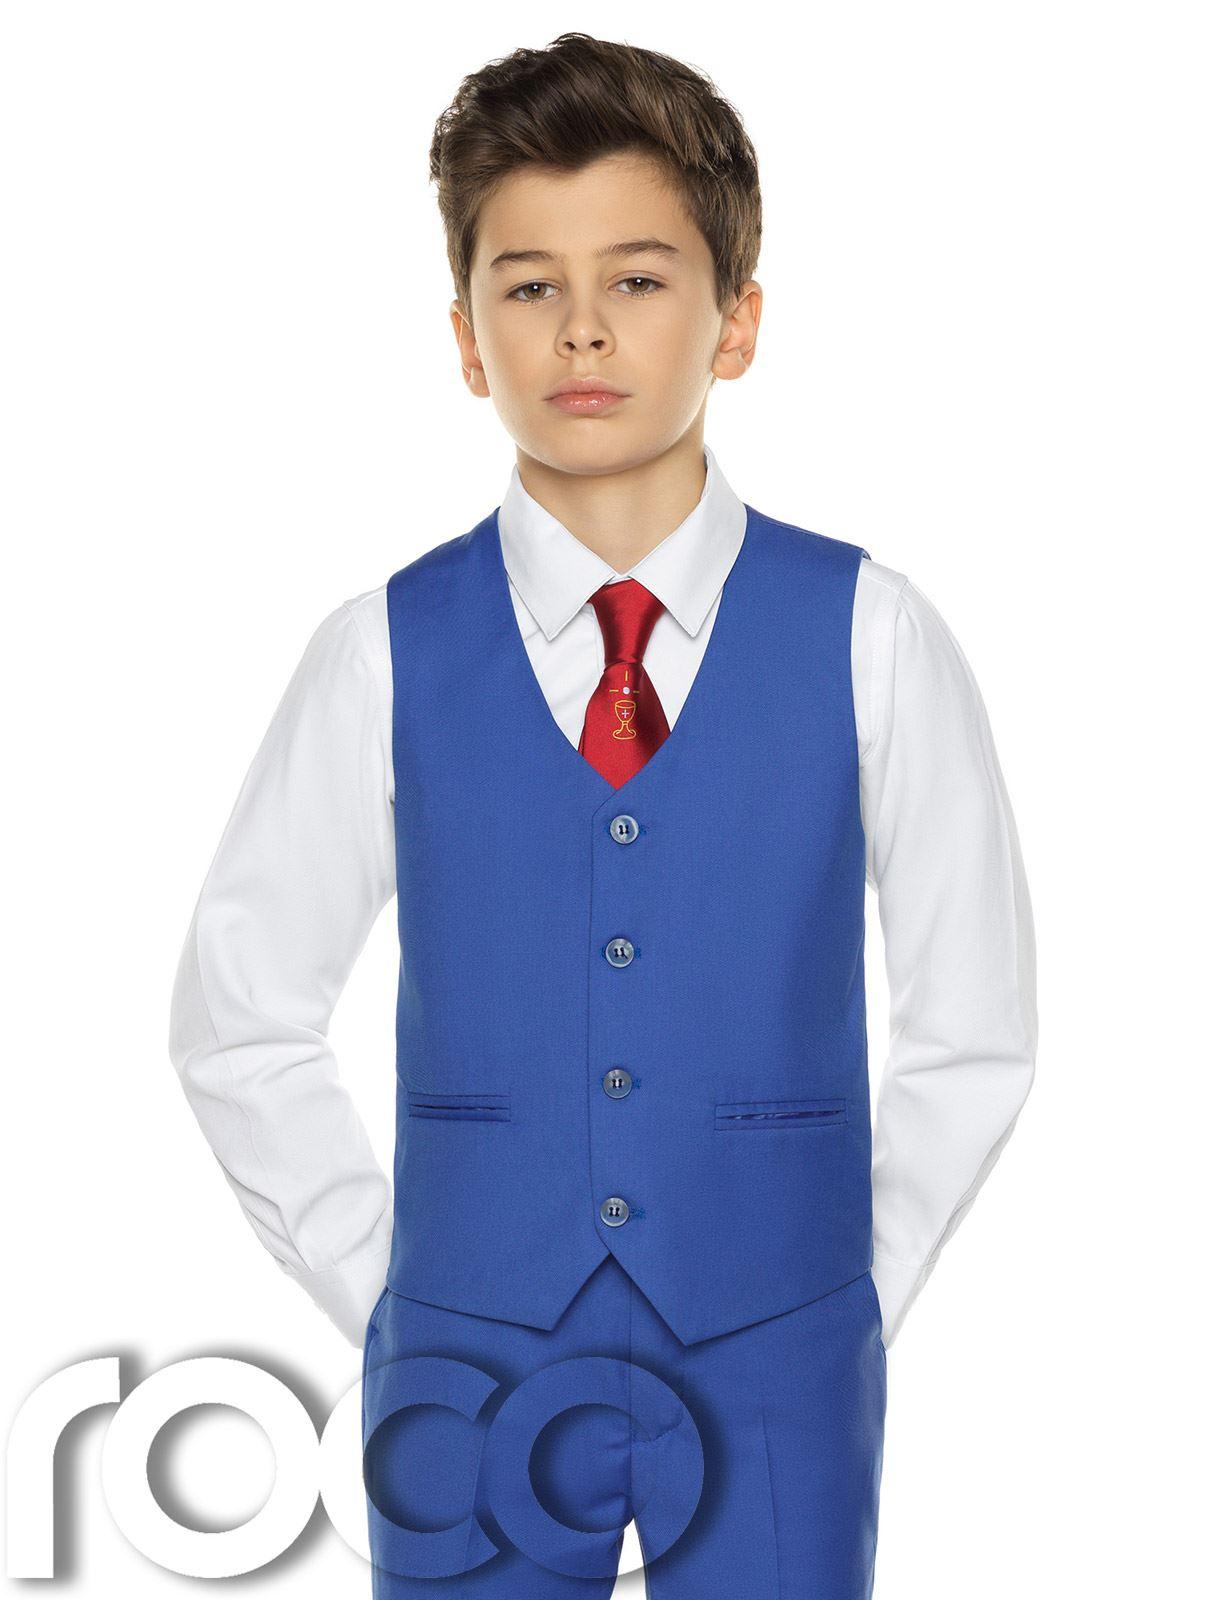 Garcons-Costume-Bleu-Communion-Costume-Bleu-Communion-Costume miniature 17